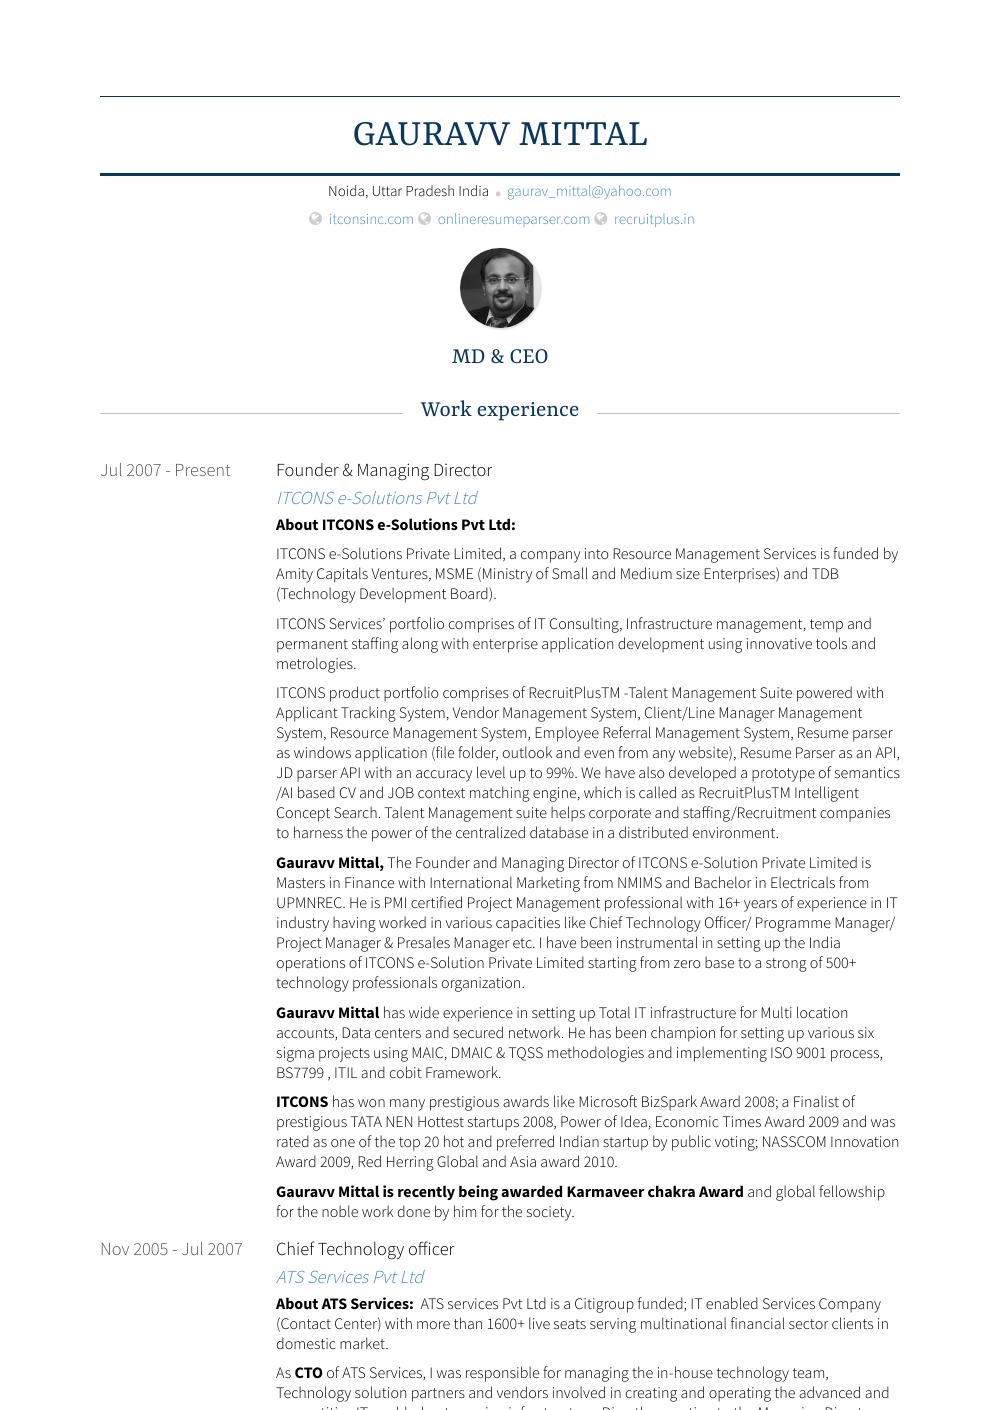 Founder & Managing Director Resume Sample